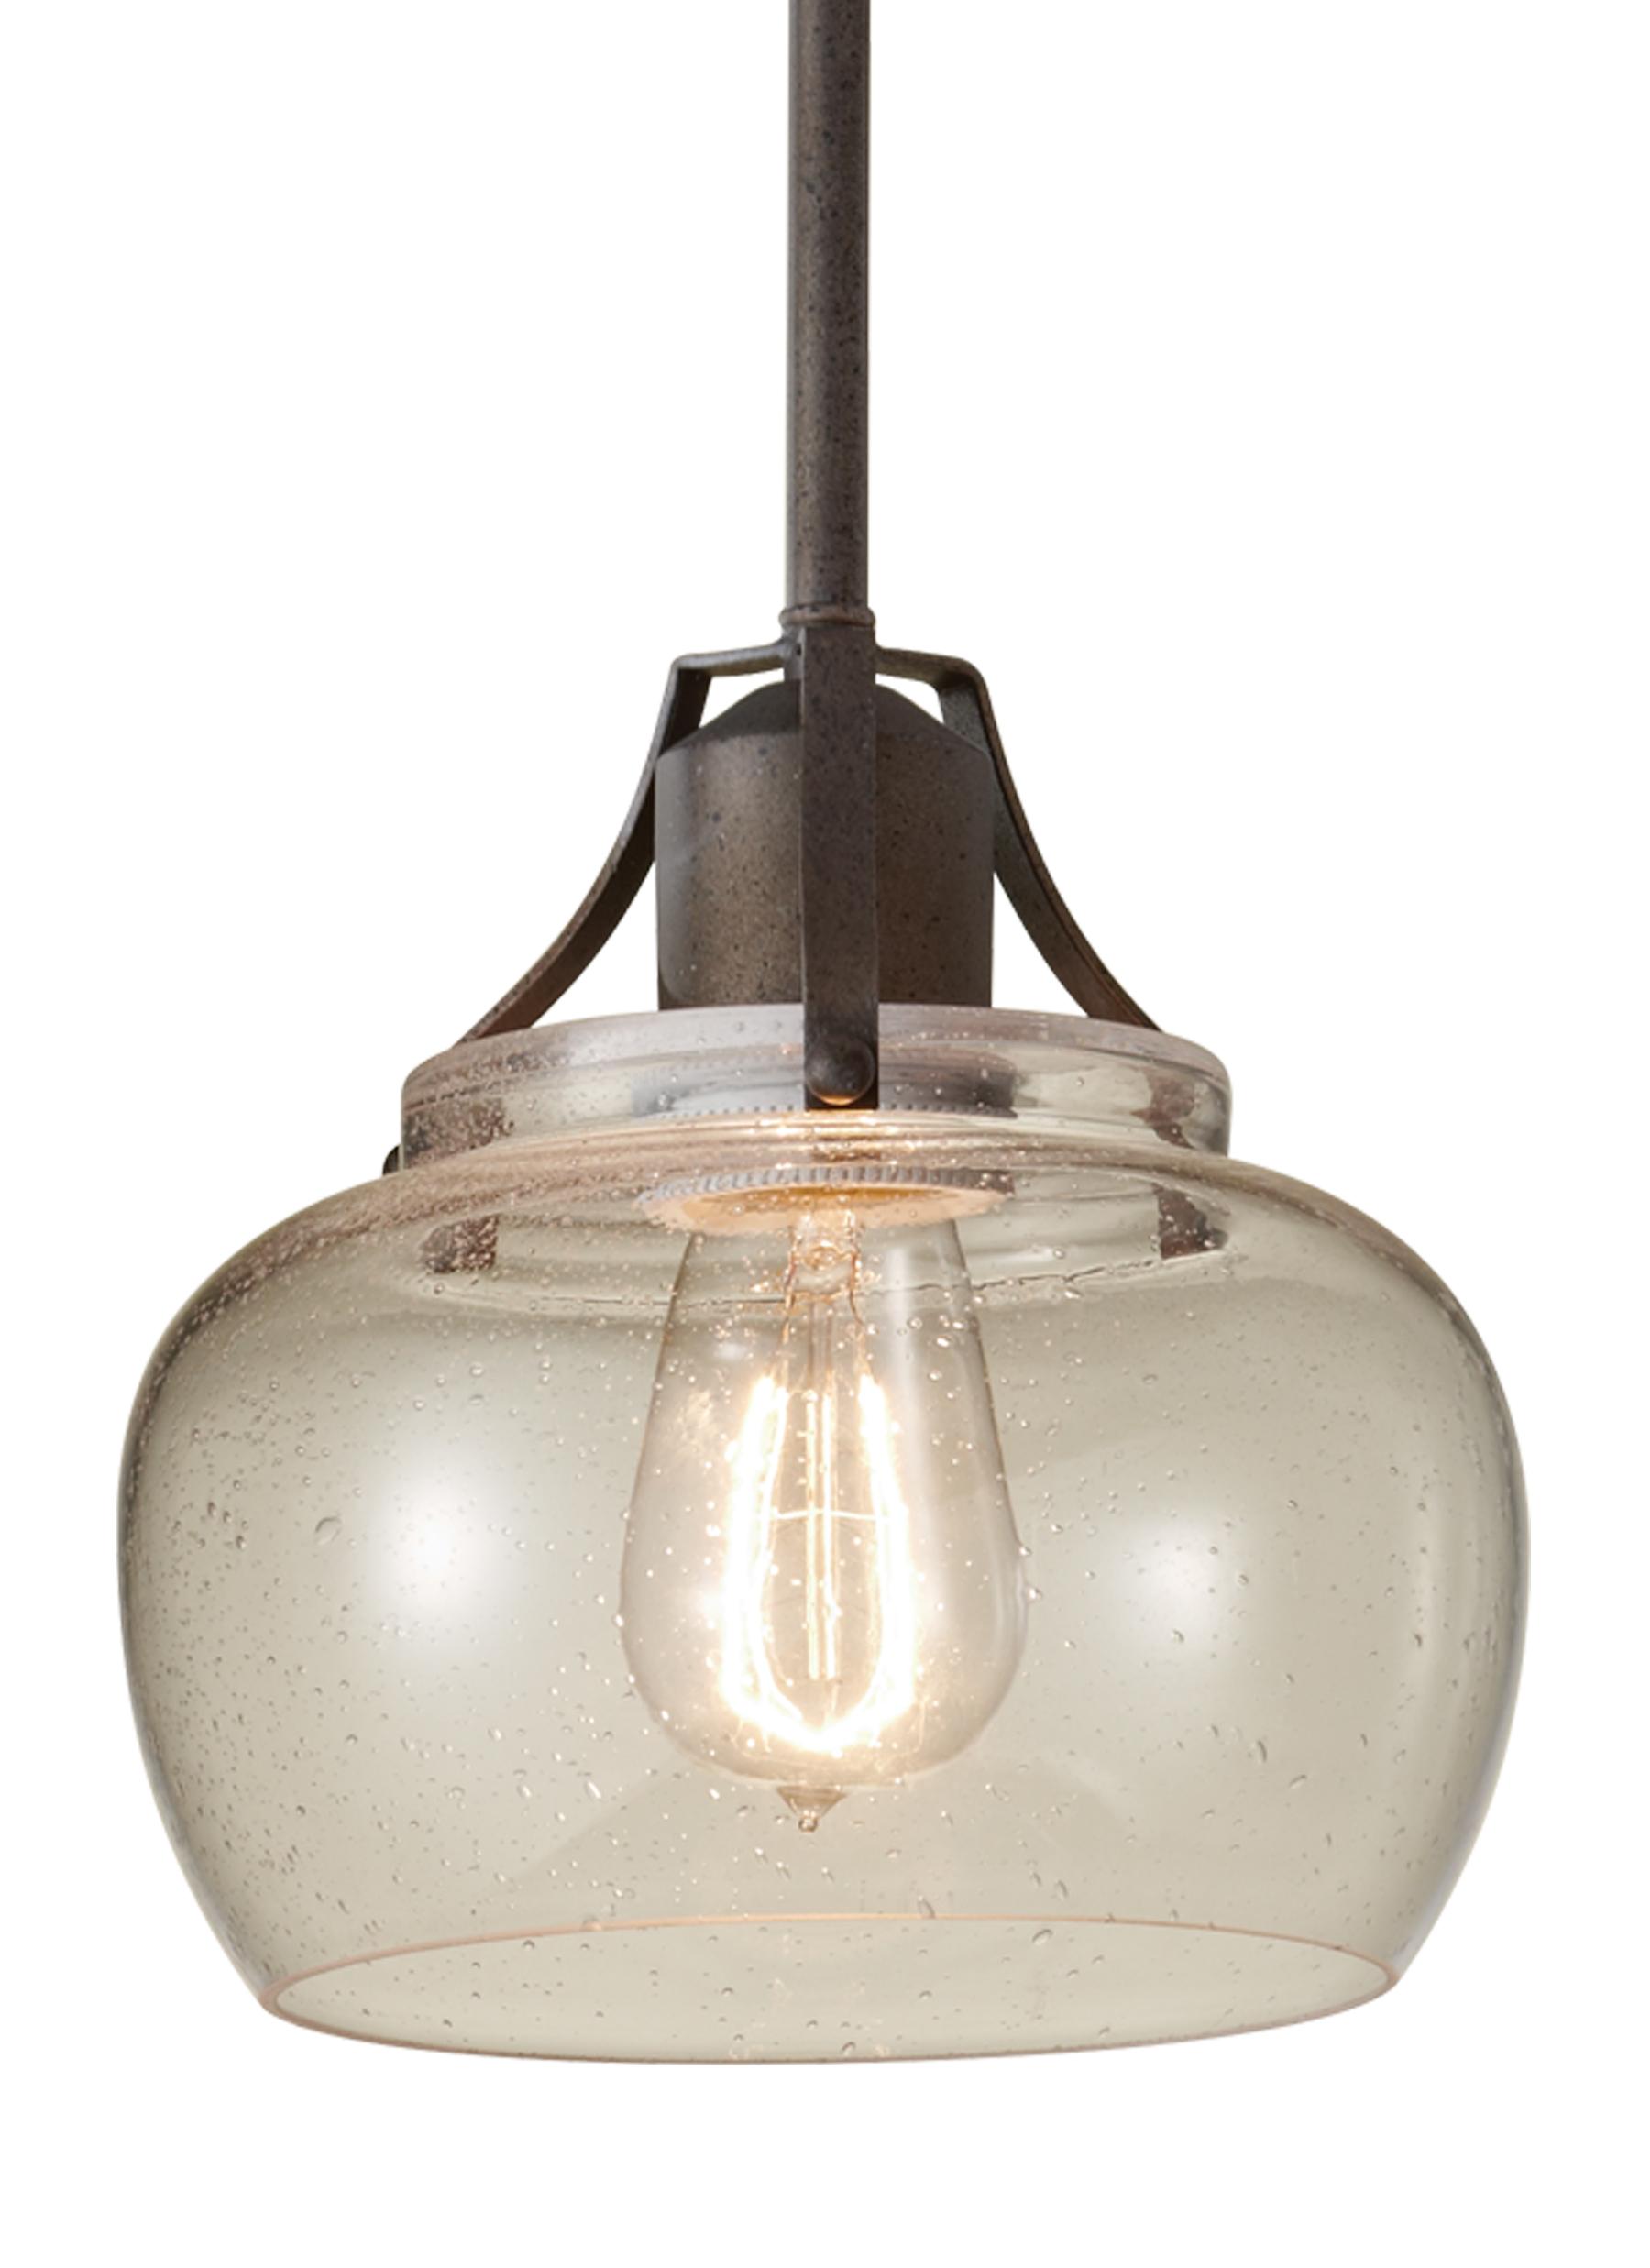 1 Light Urban Renewal PRI rustic kitchen pendant lights Loading zoom